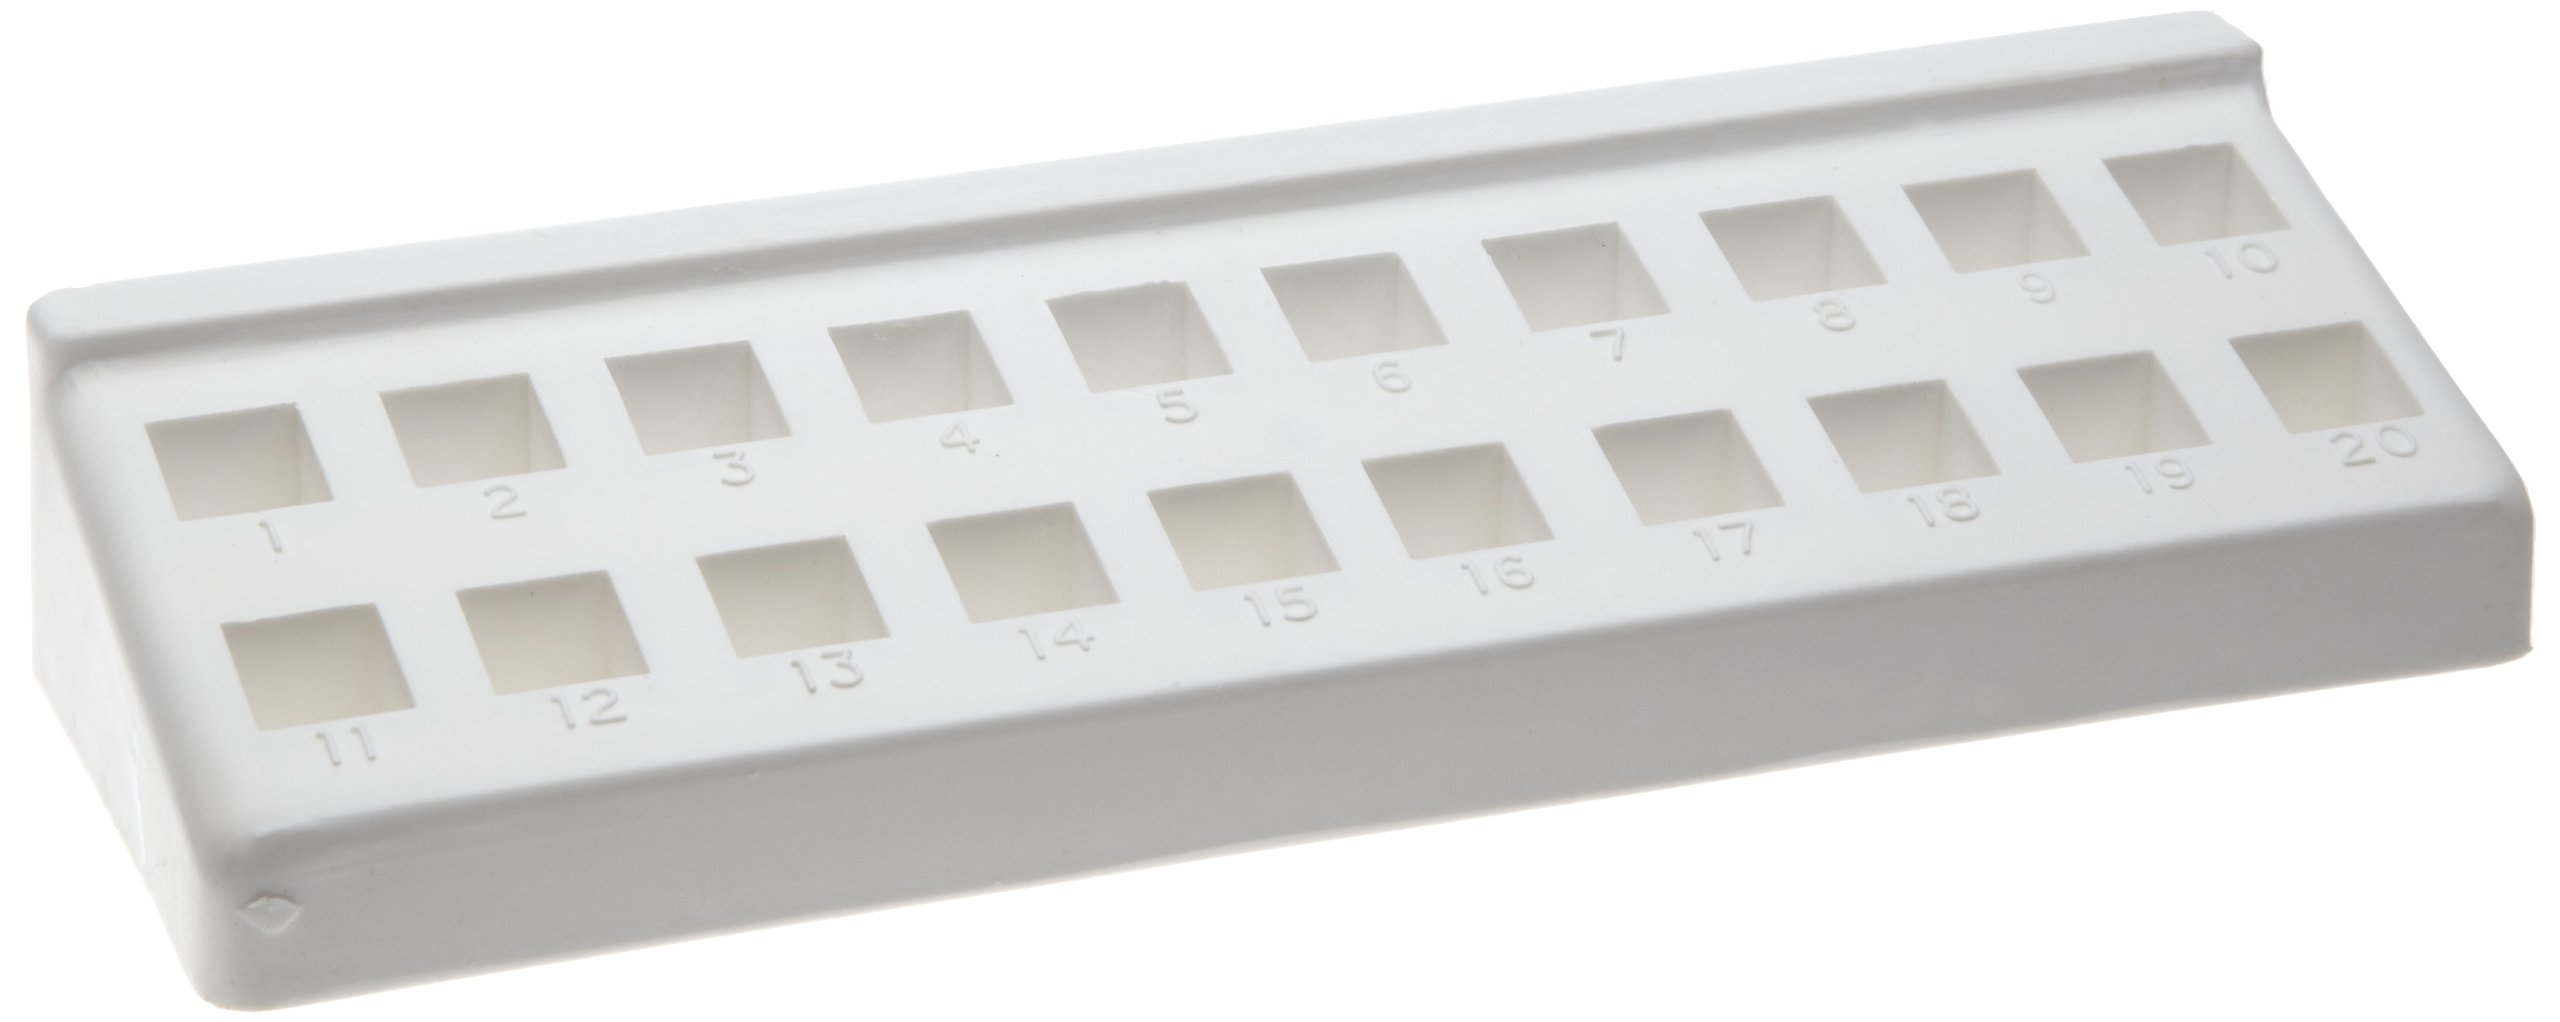 Bel-Art F18515-0000 Spectro Cuvette Rack; 10mm, 20 Places, 8¼ x 2¾ x 1⅜ in., Polypropylene